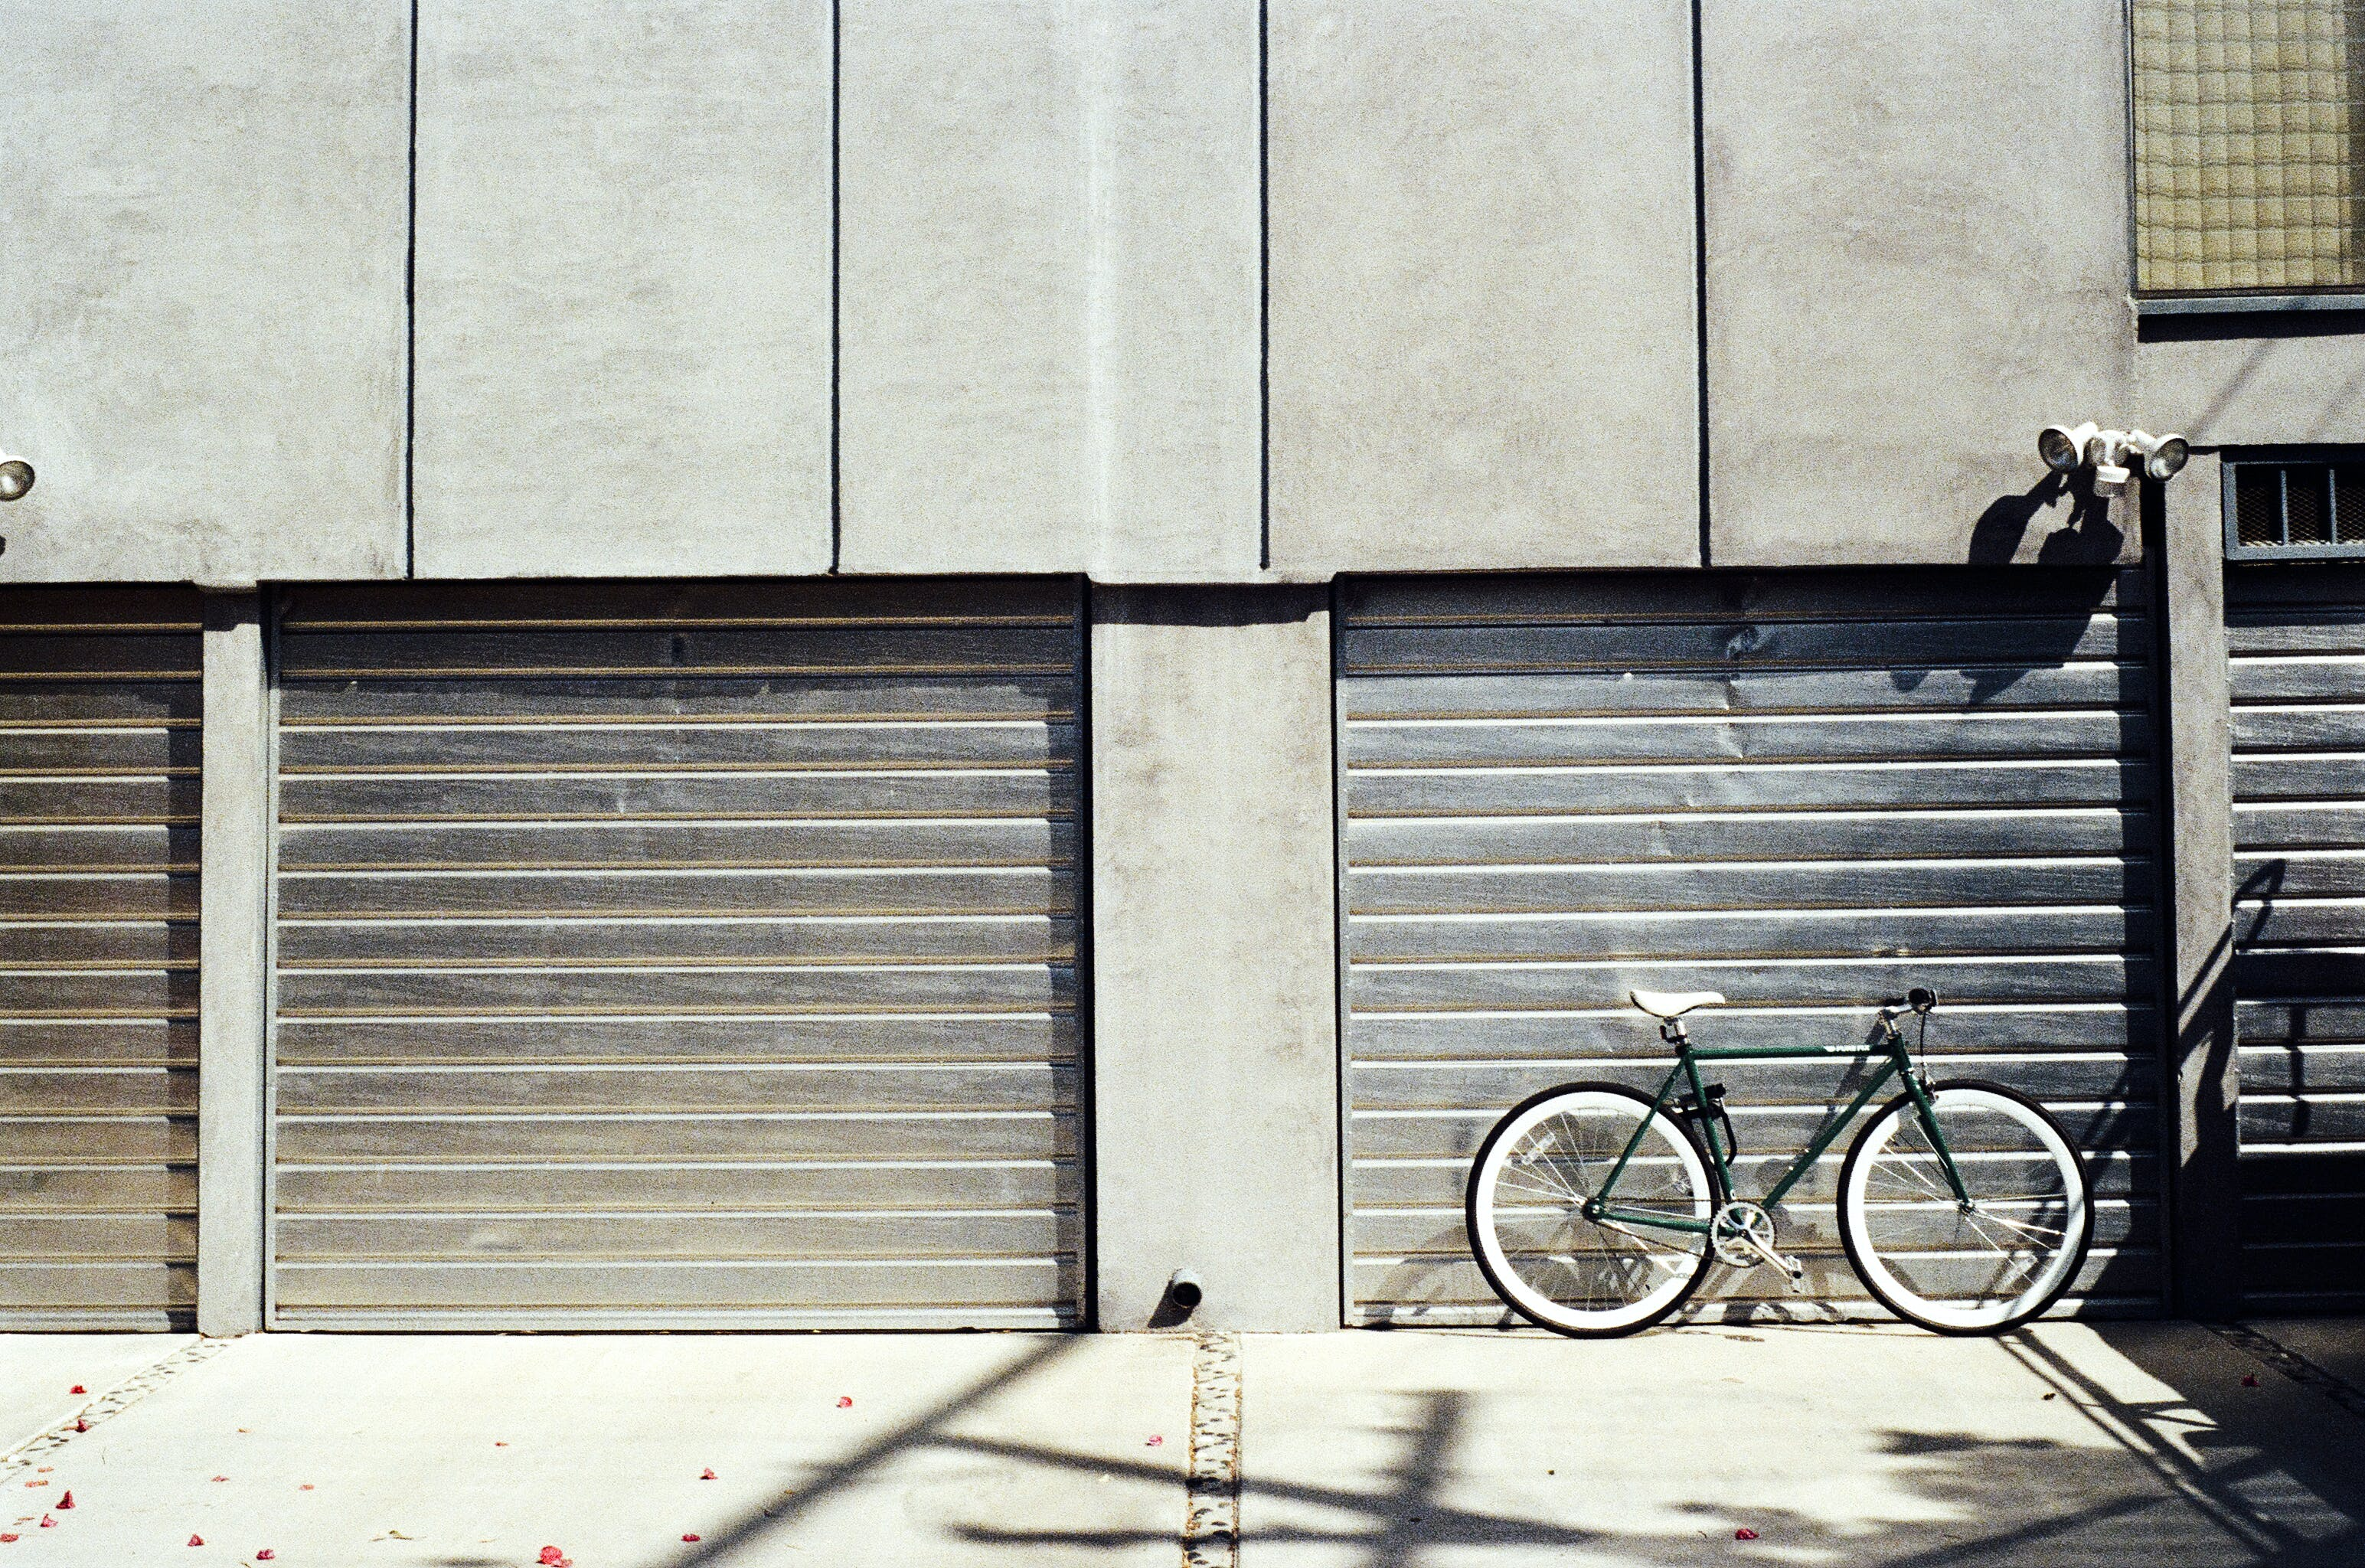 Green Bike Near Roll-up Door